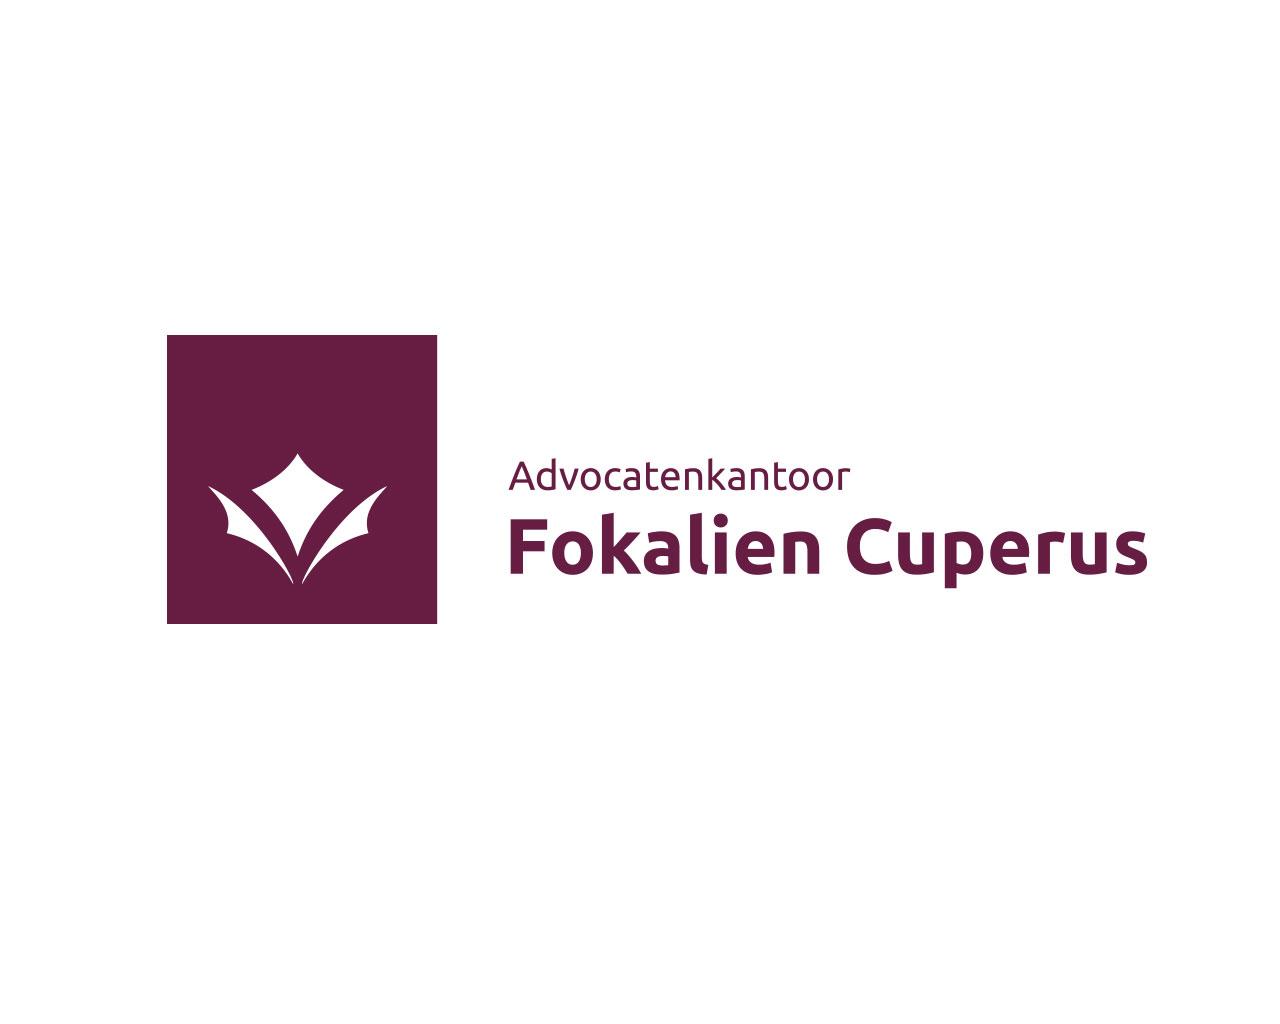 logo fokalien cuperus